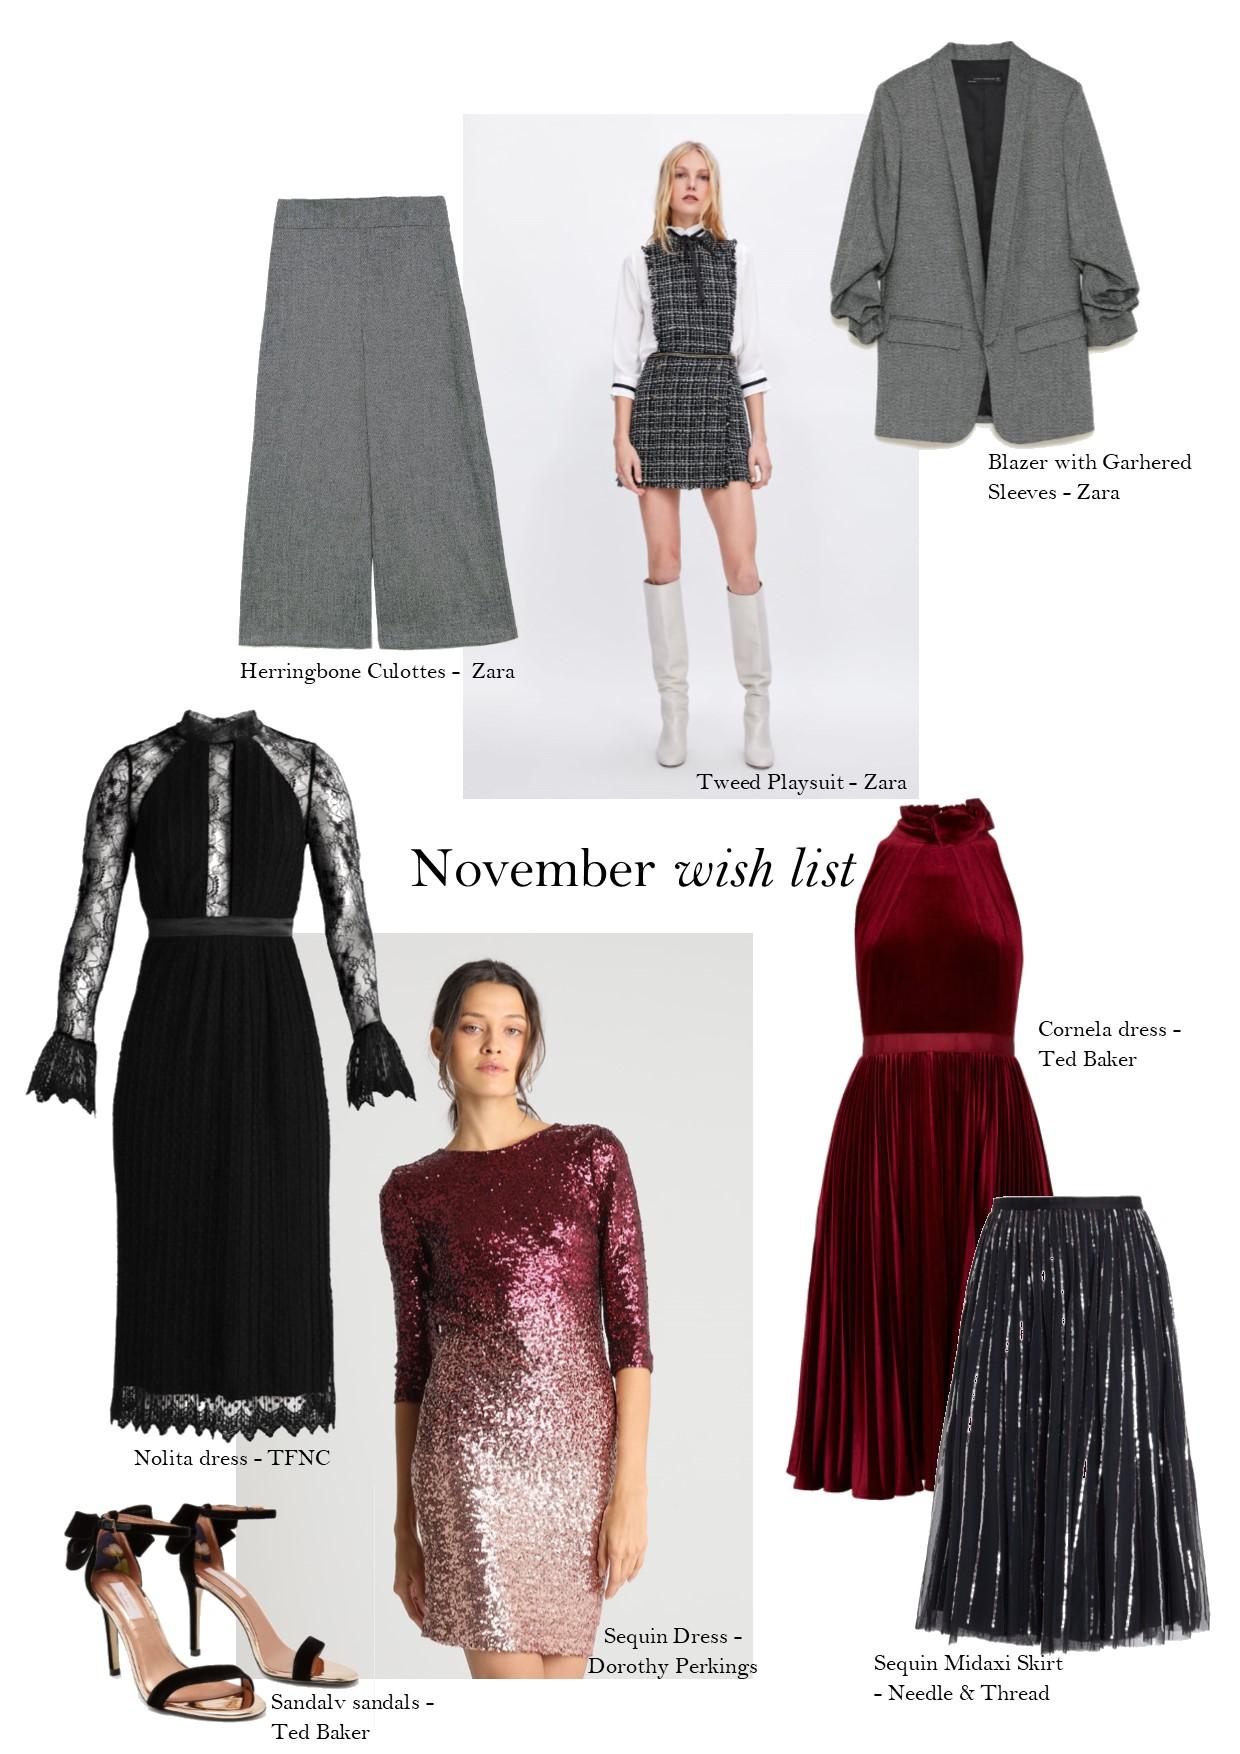 November wish list 1.jpg